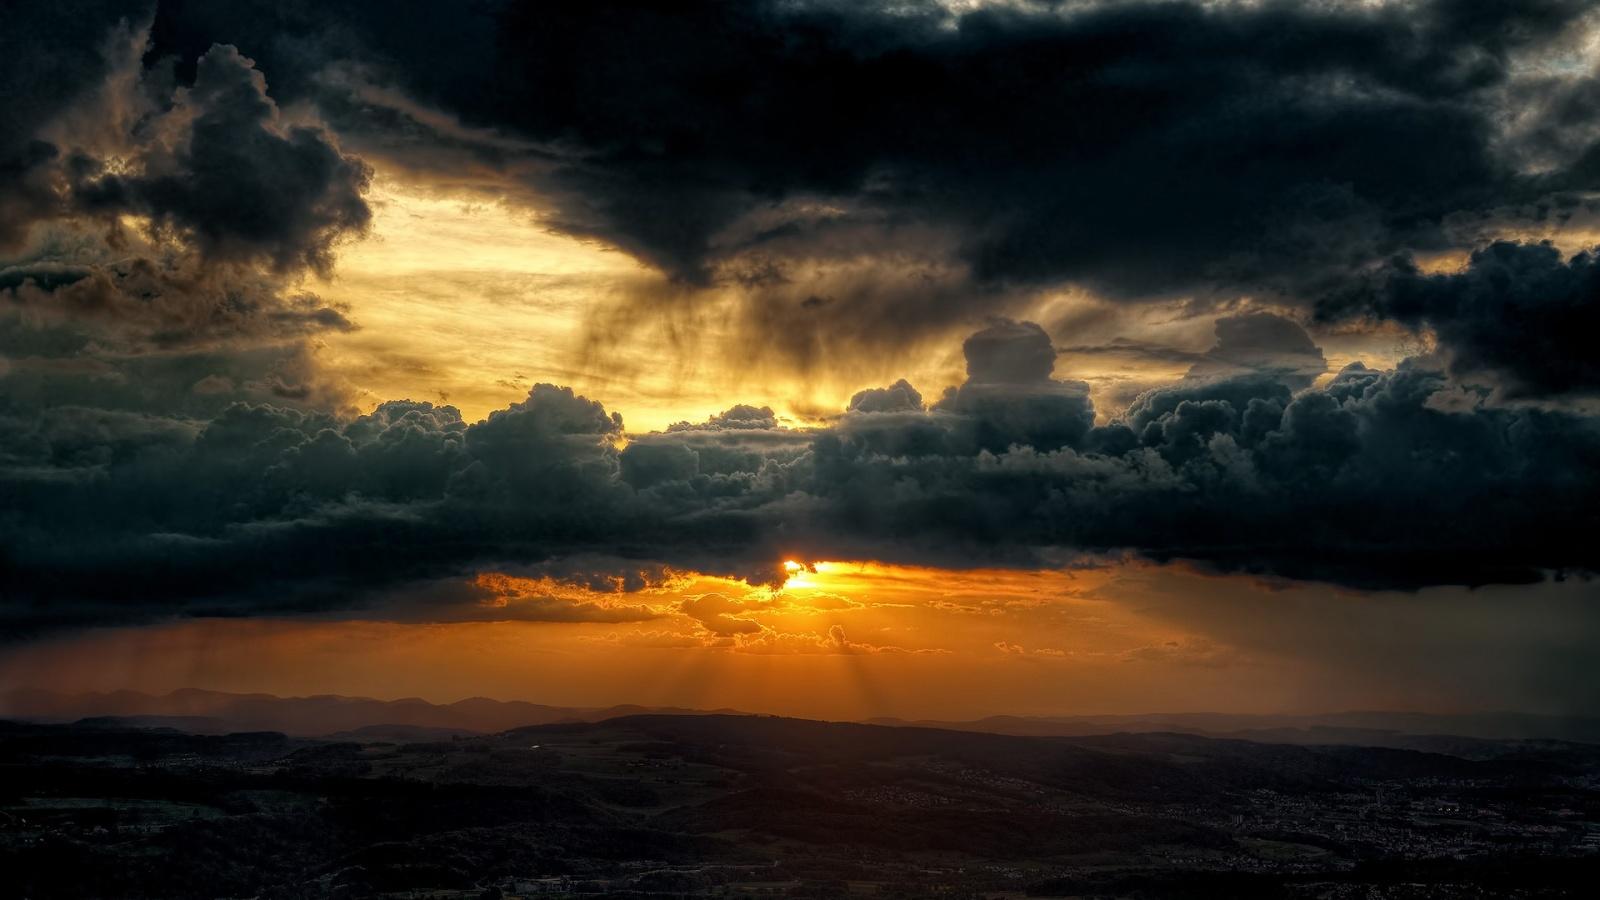 Dark Clouds Sky Sun Wallpapers   1600x900   303058 1600x900